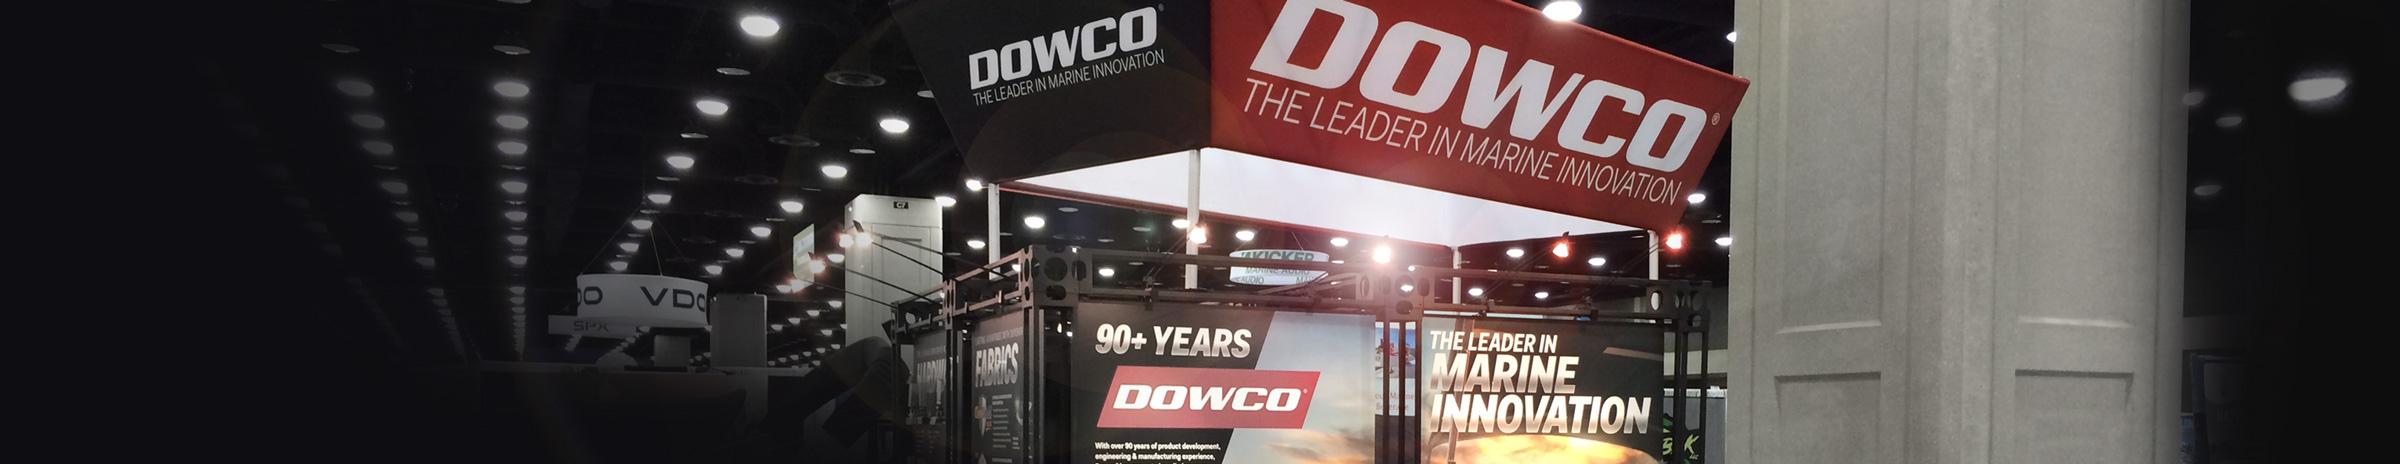 About Dowco Marine